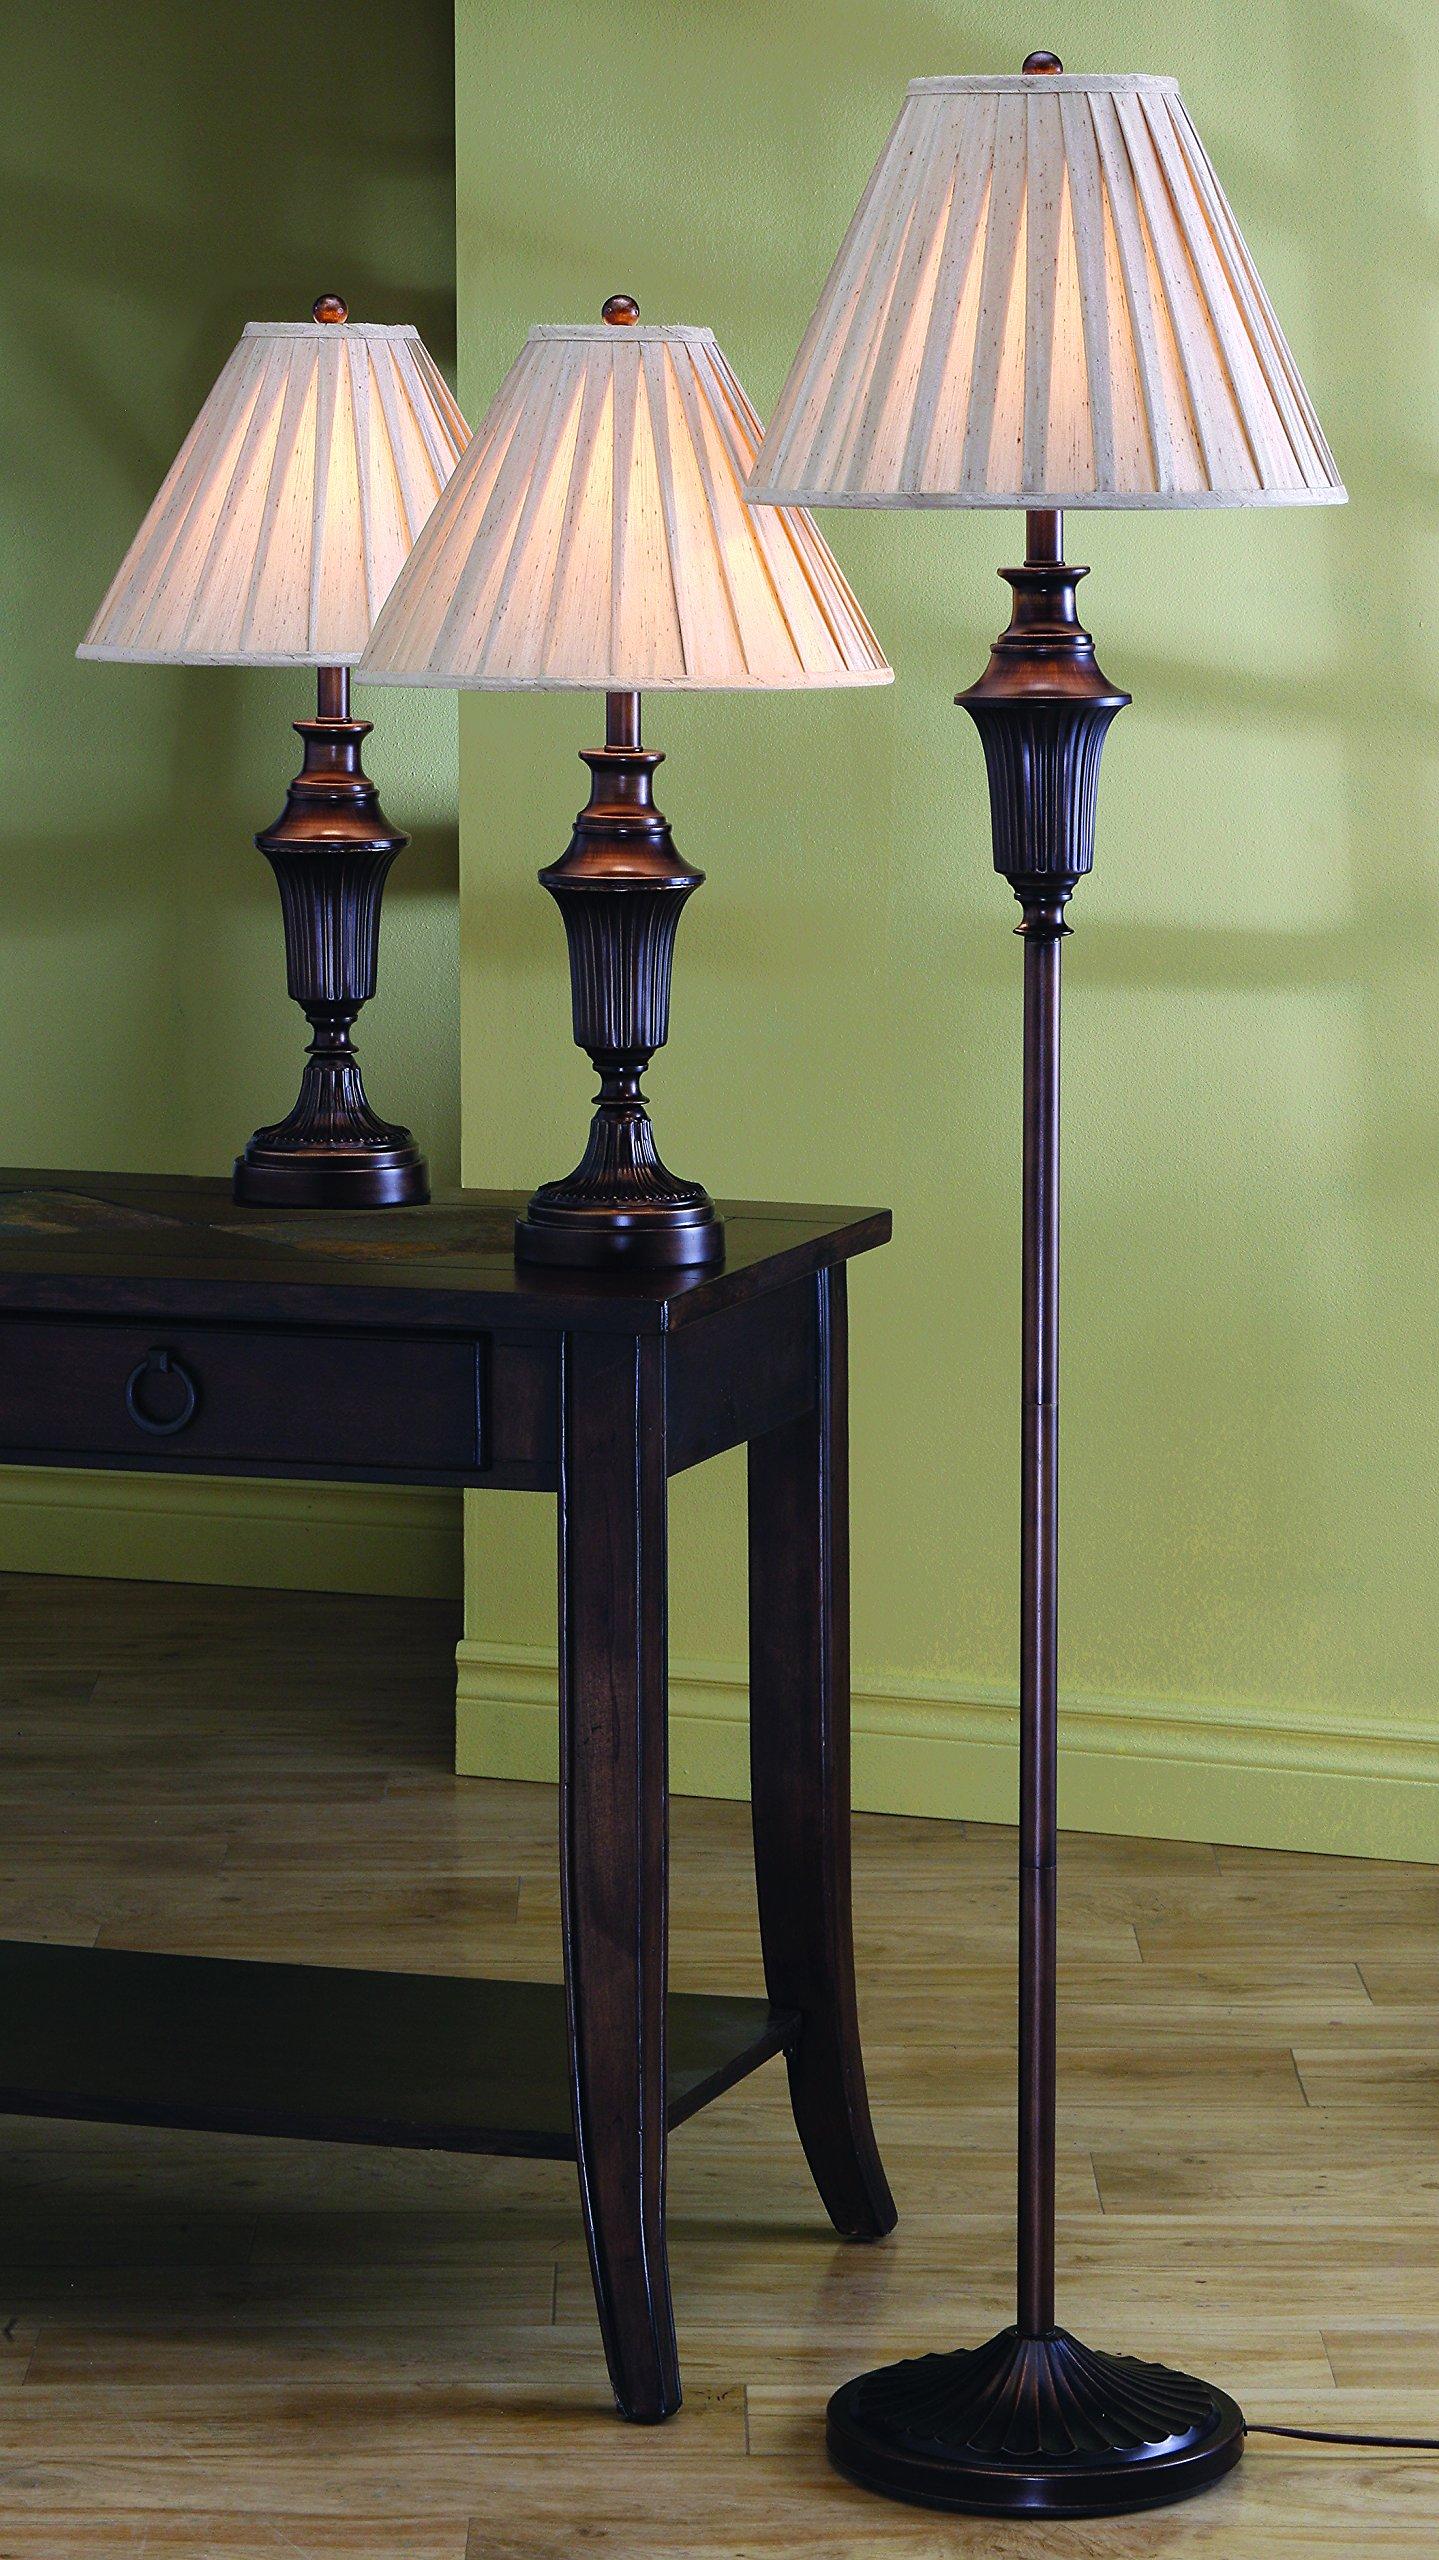 2 table lamps and 1 floor lamp dark brown finish 3 piece set living room lights ebay. Black Bedroom Furniture Sets. Home Design Ideas